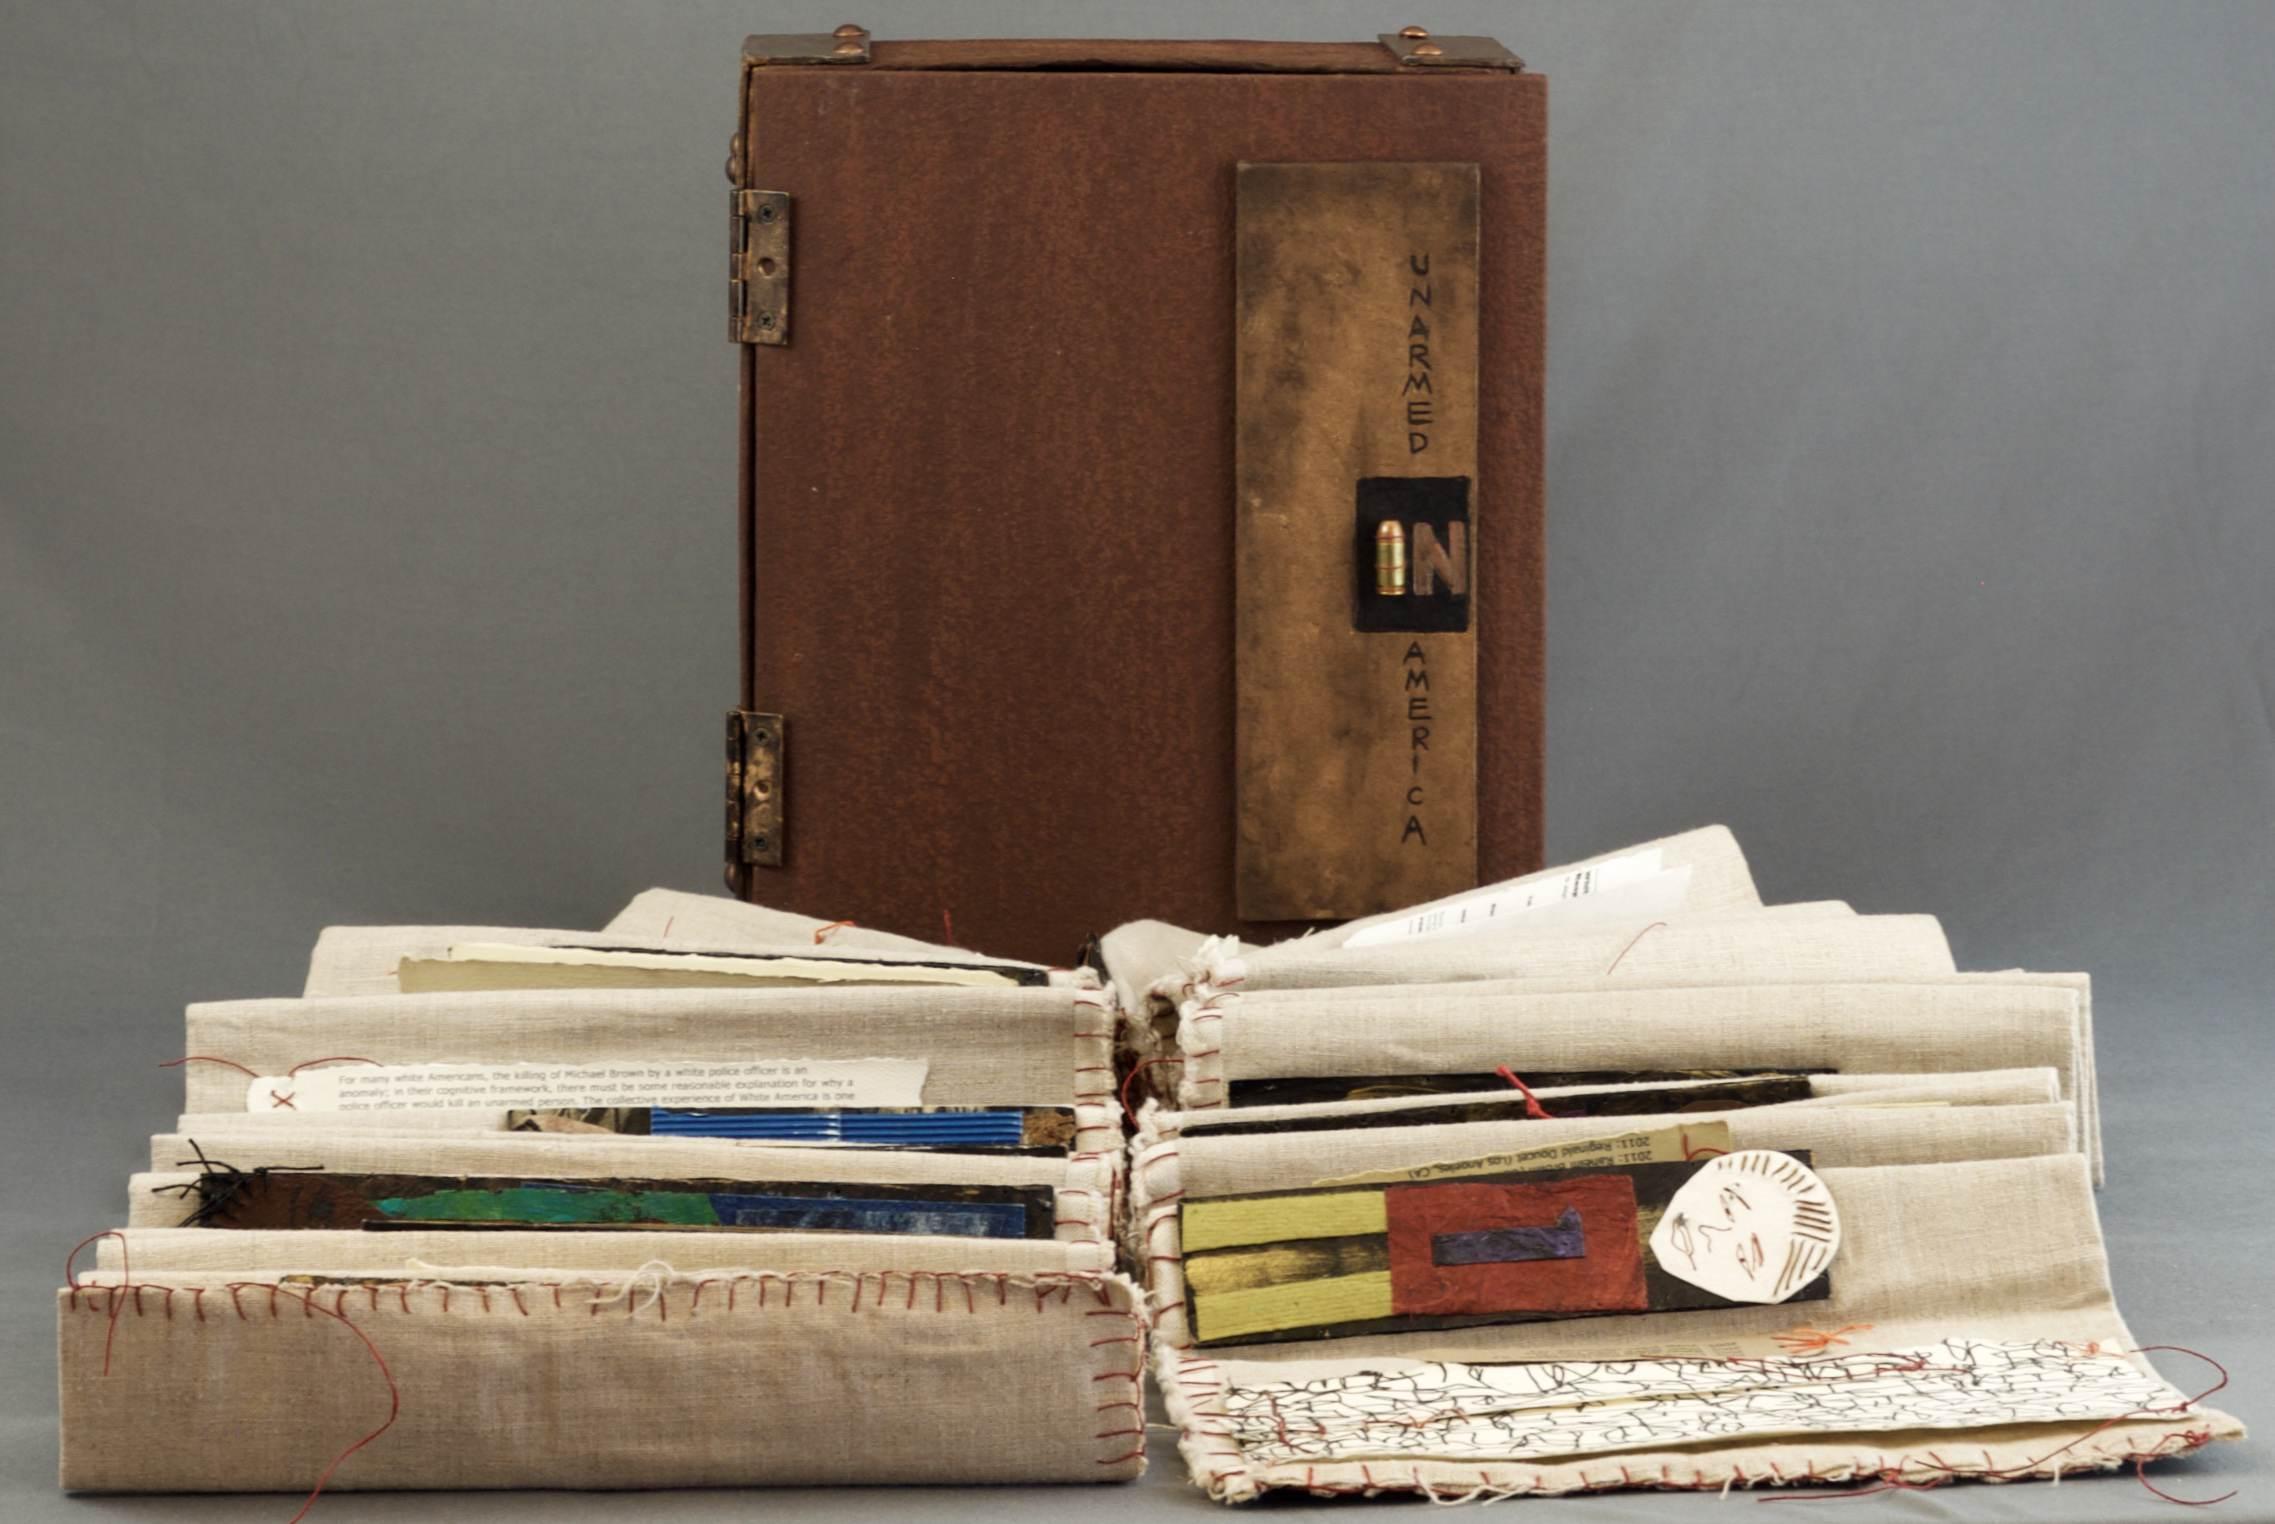 10) BOOKWORKS Serling-Sturm copy